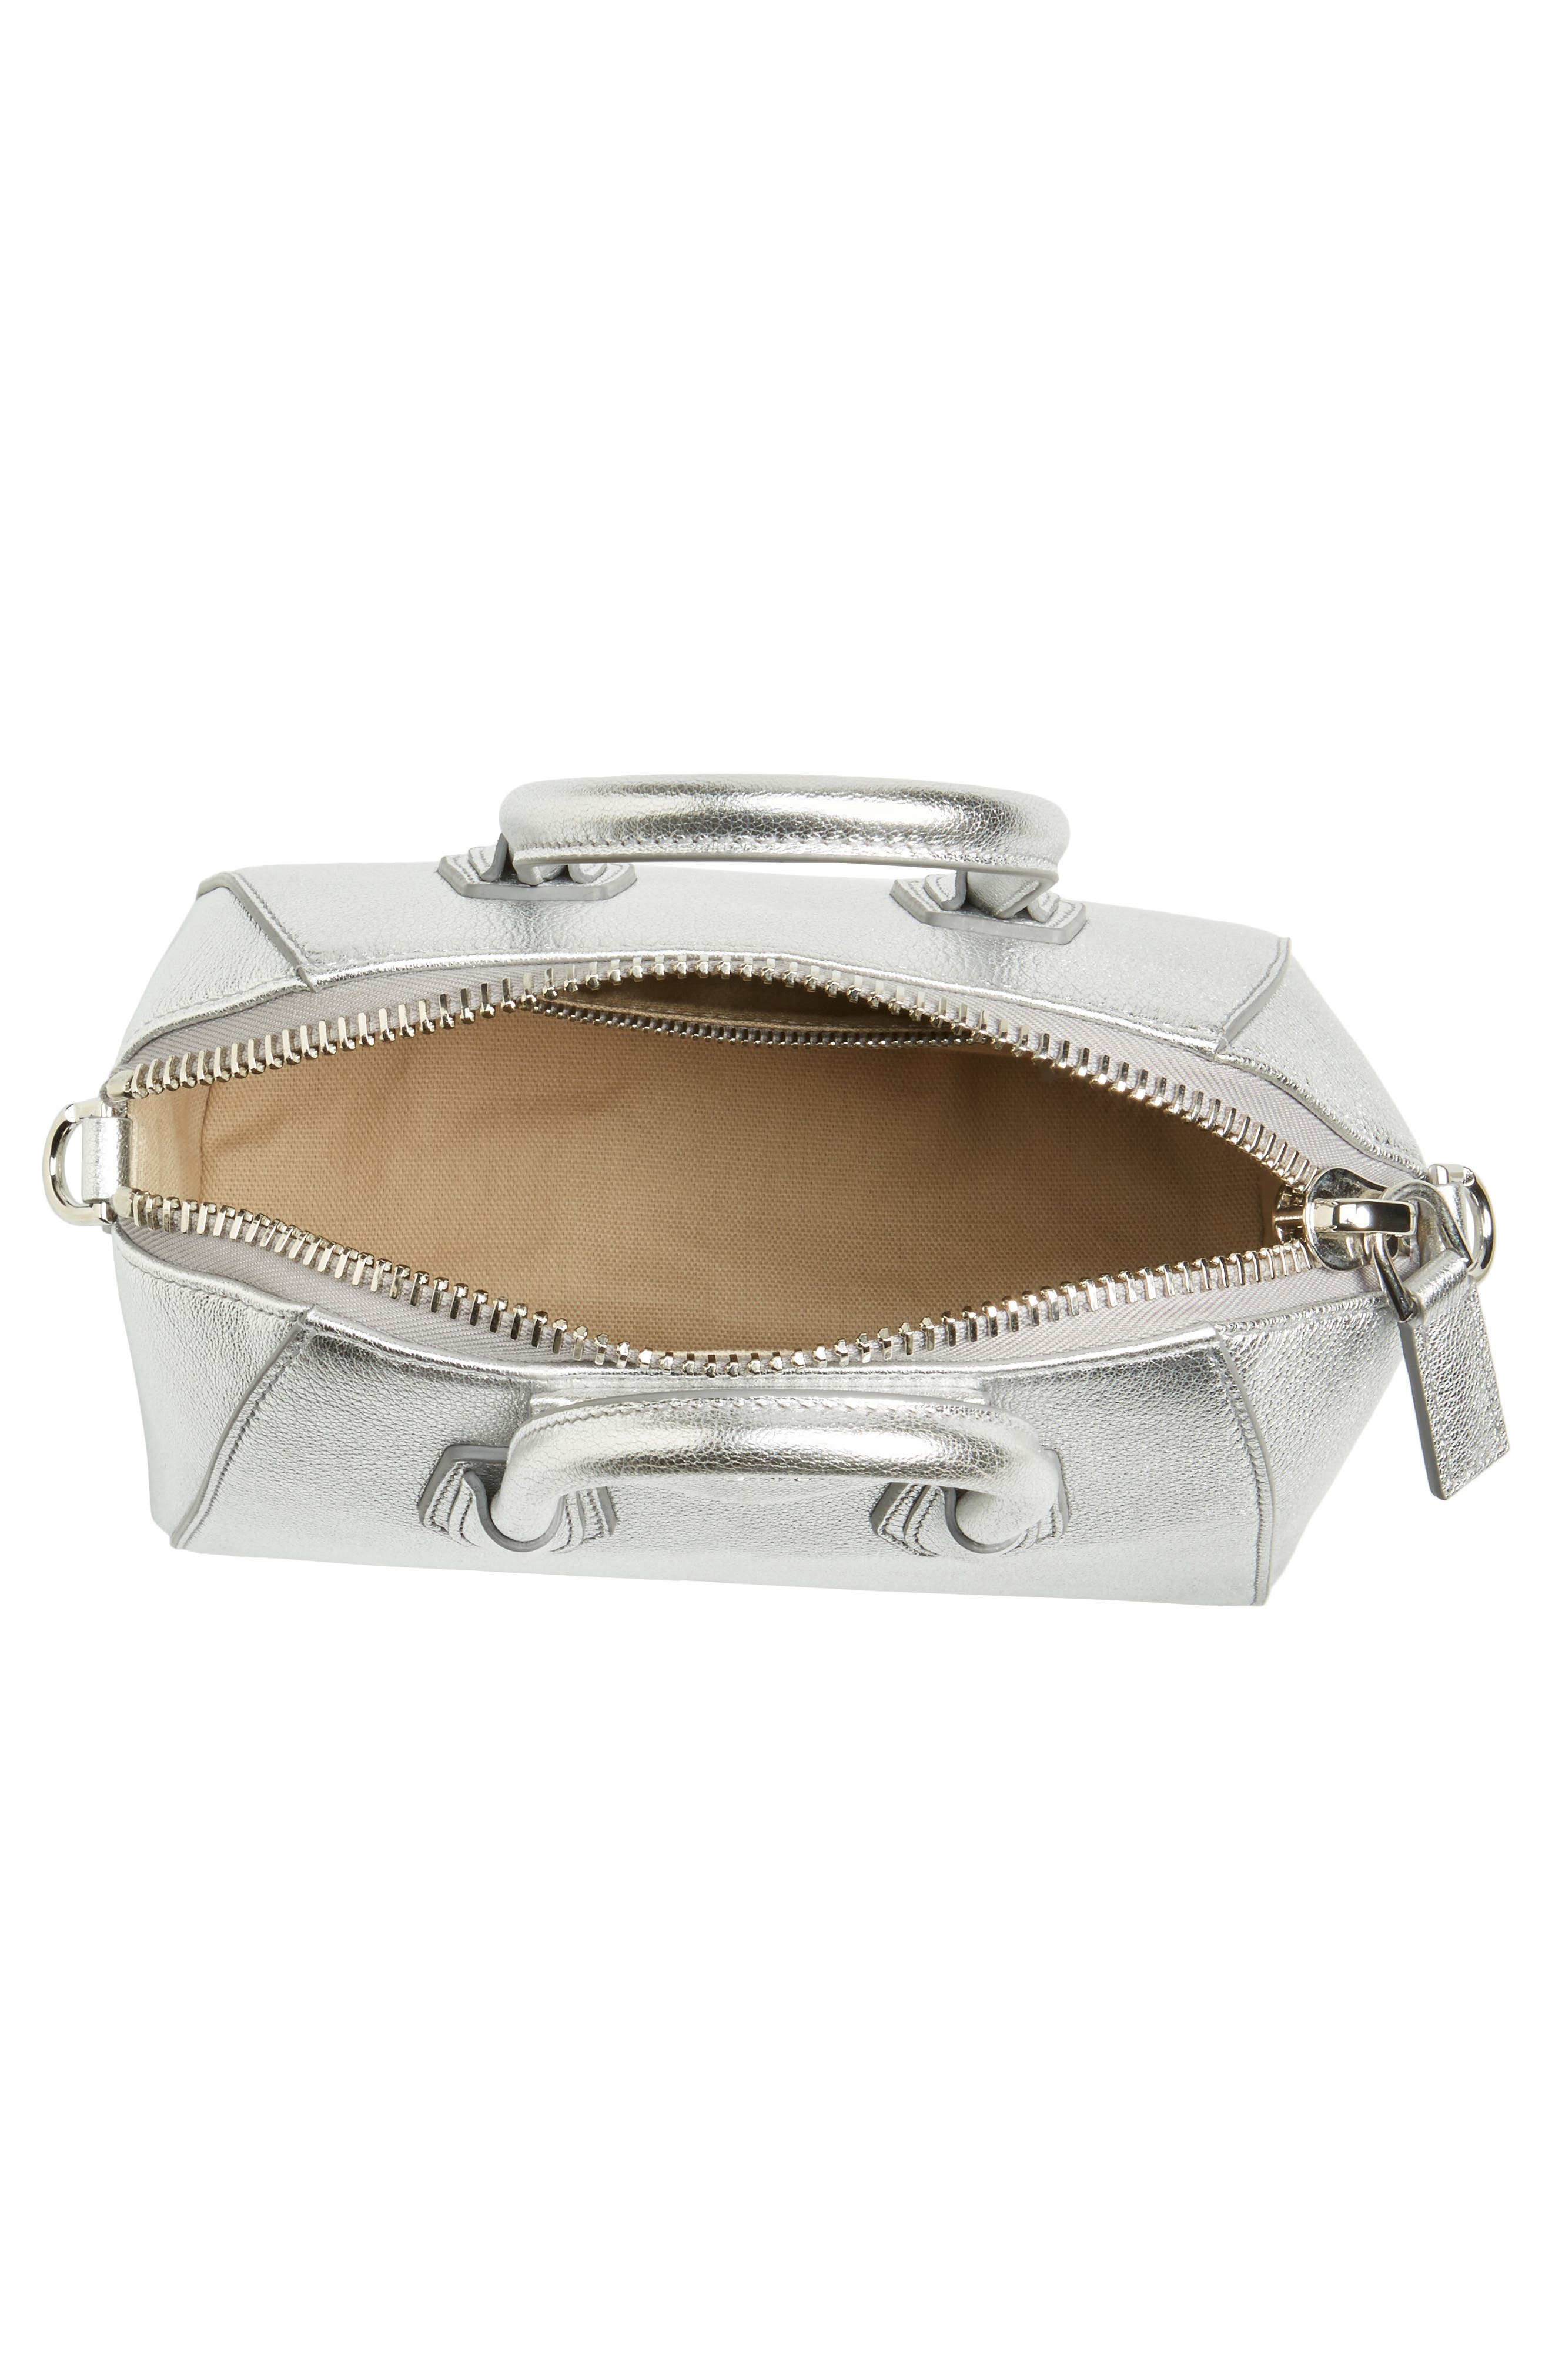 Mini Antigona Metallic Leather Satchel,                             Alternate thumbnail 3, color,                             Silver